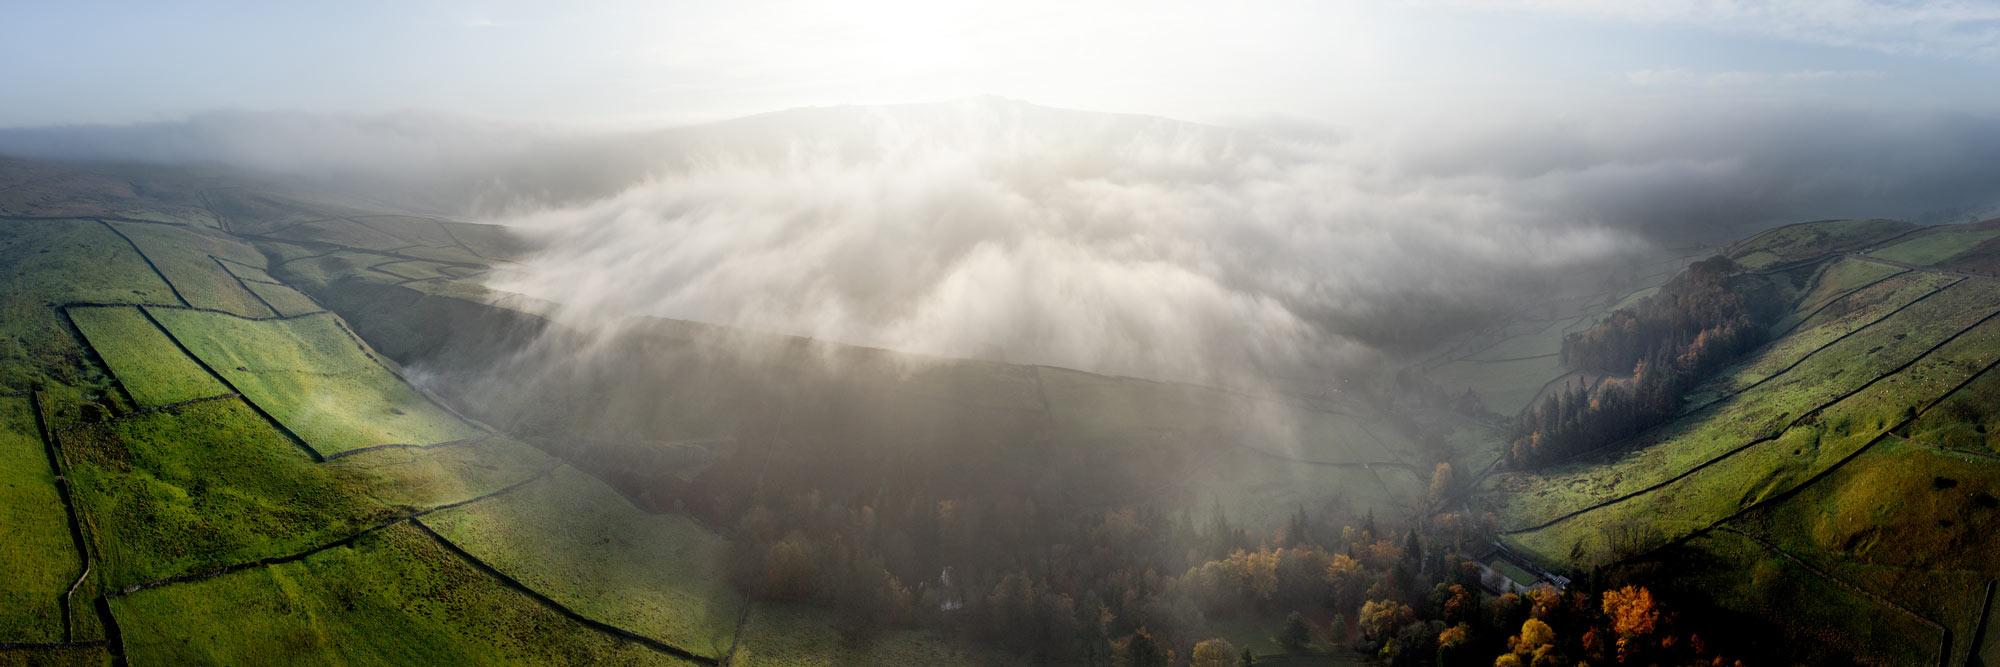 panoramic print of the Yorkshire Dales